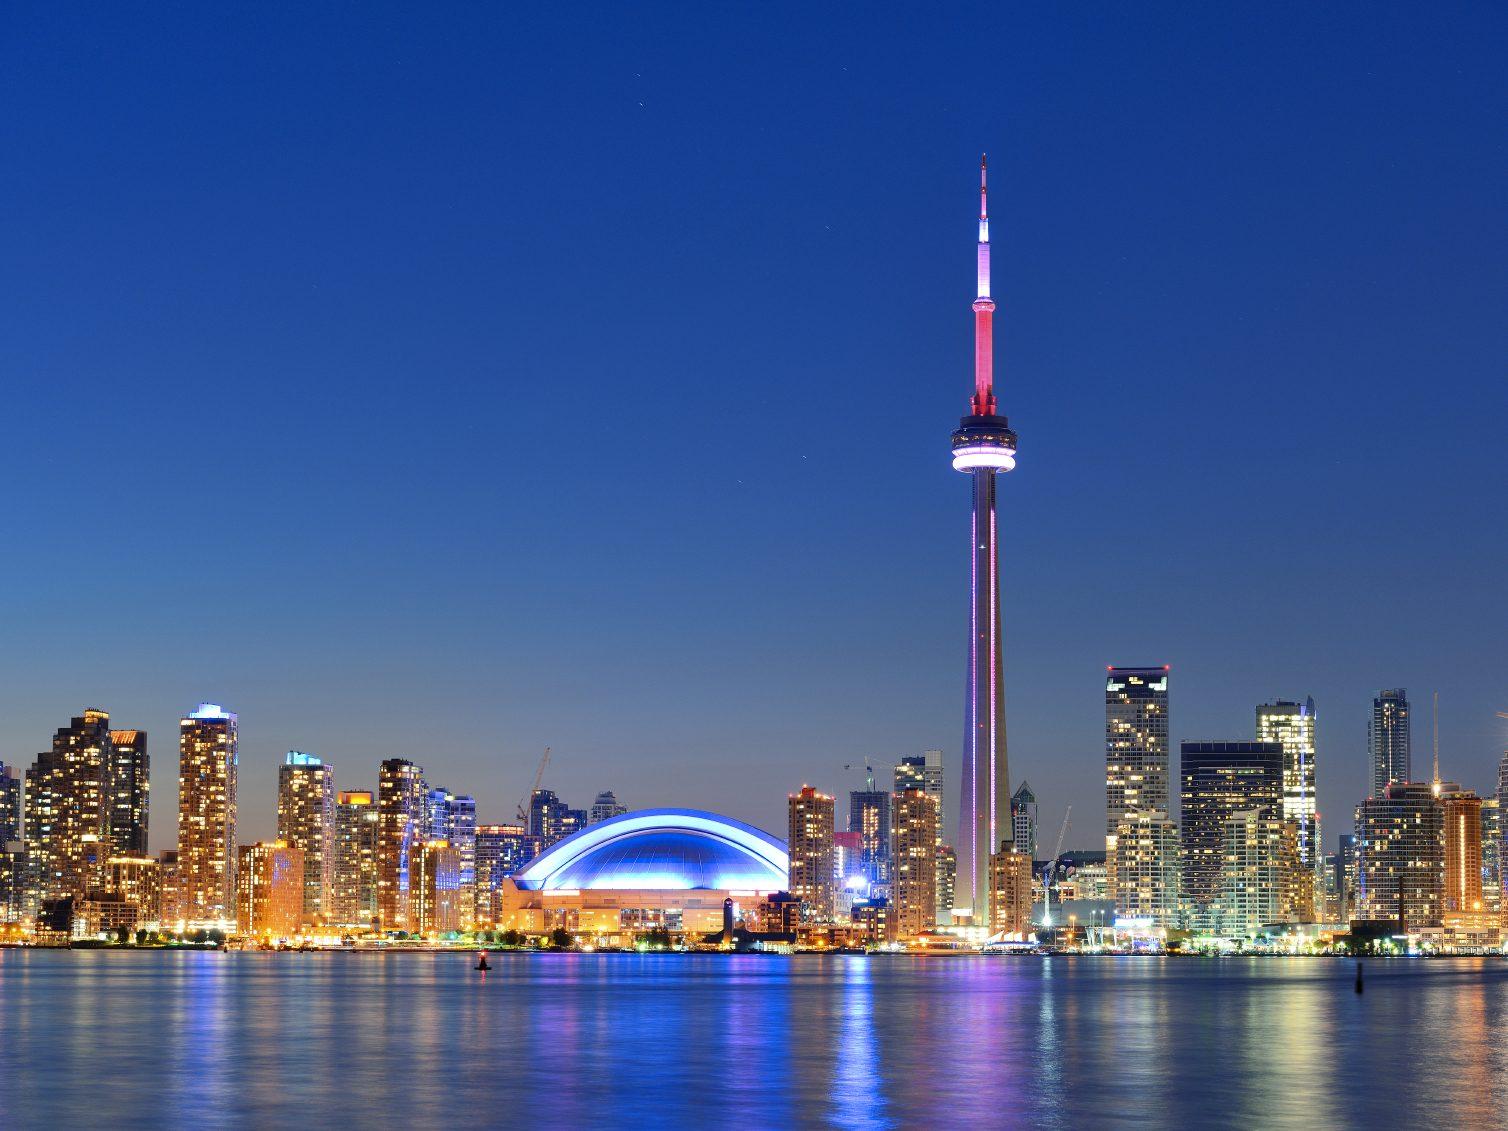 2. Toronto, Ontario